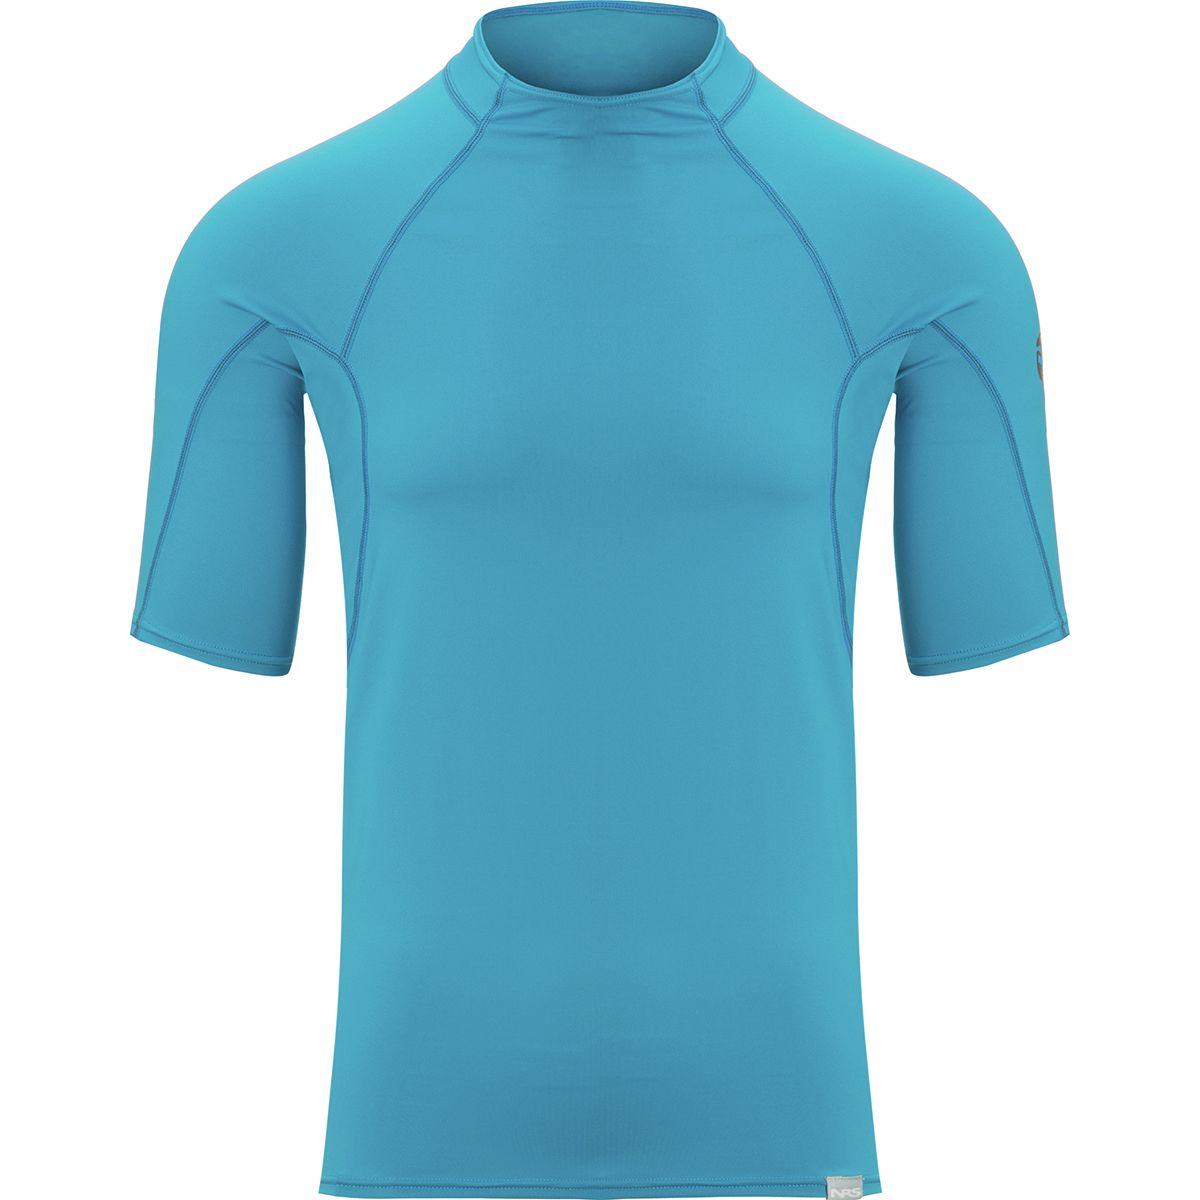 photo: NRS Men's H2Core Rashguard Short-Sleeve short sleeve paddling shirt